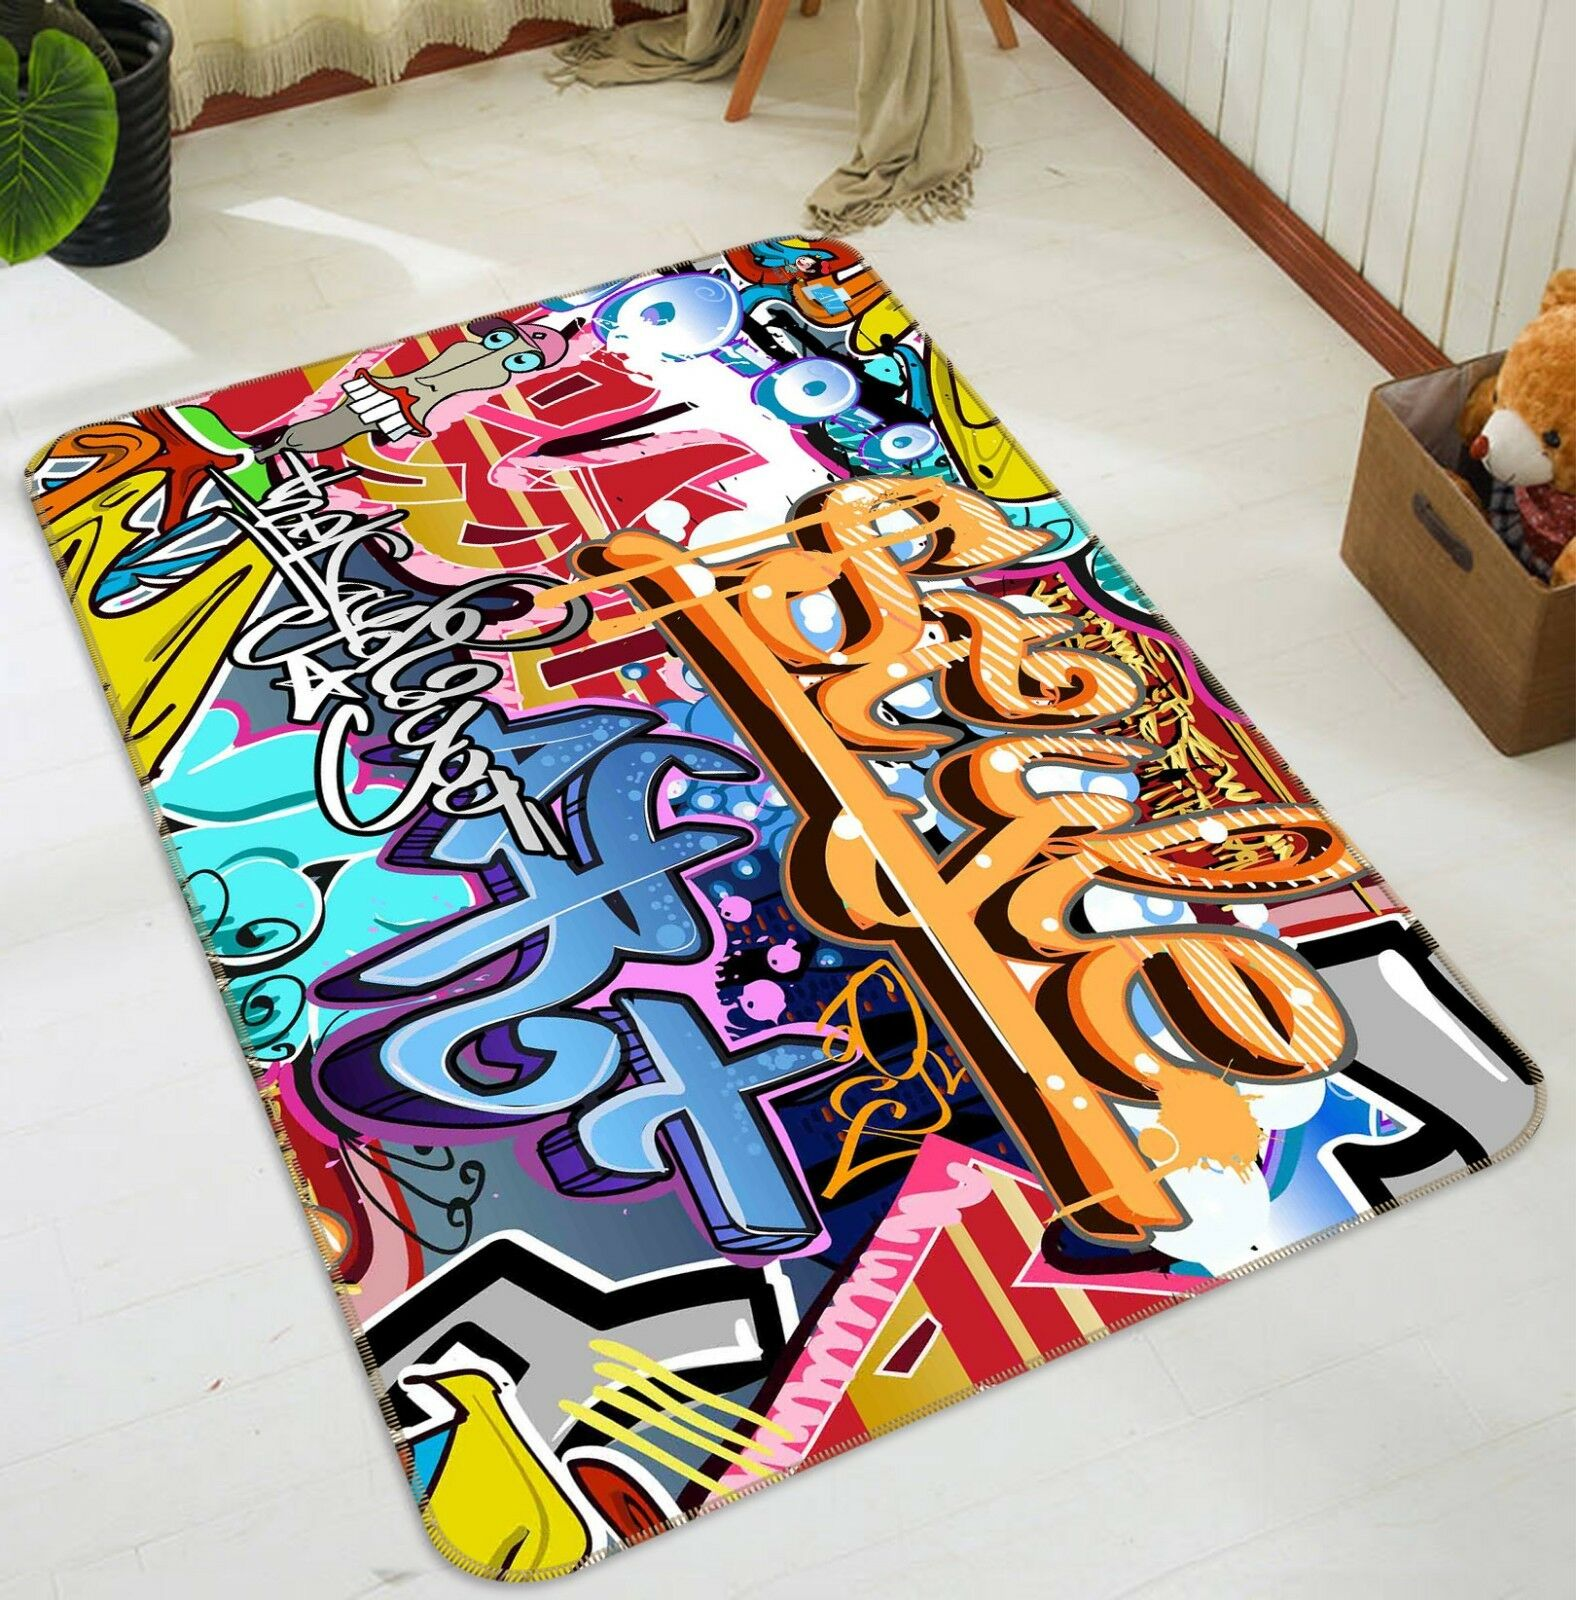 3D Coloree Graffiti 789 Non Slip Rug Mat Room Mat Quality Elegant Photo Carpet US